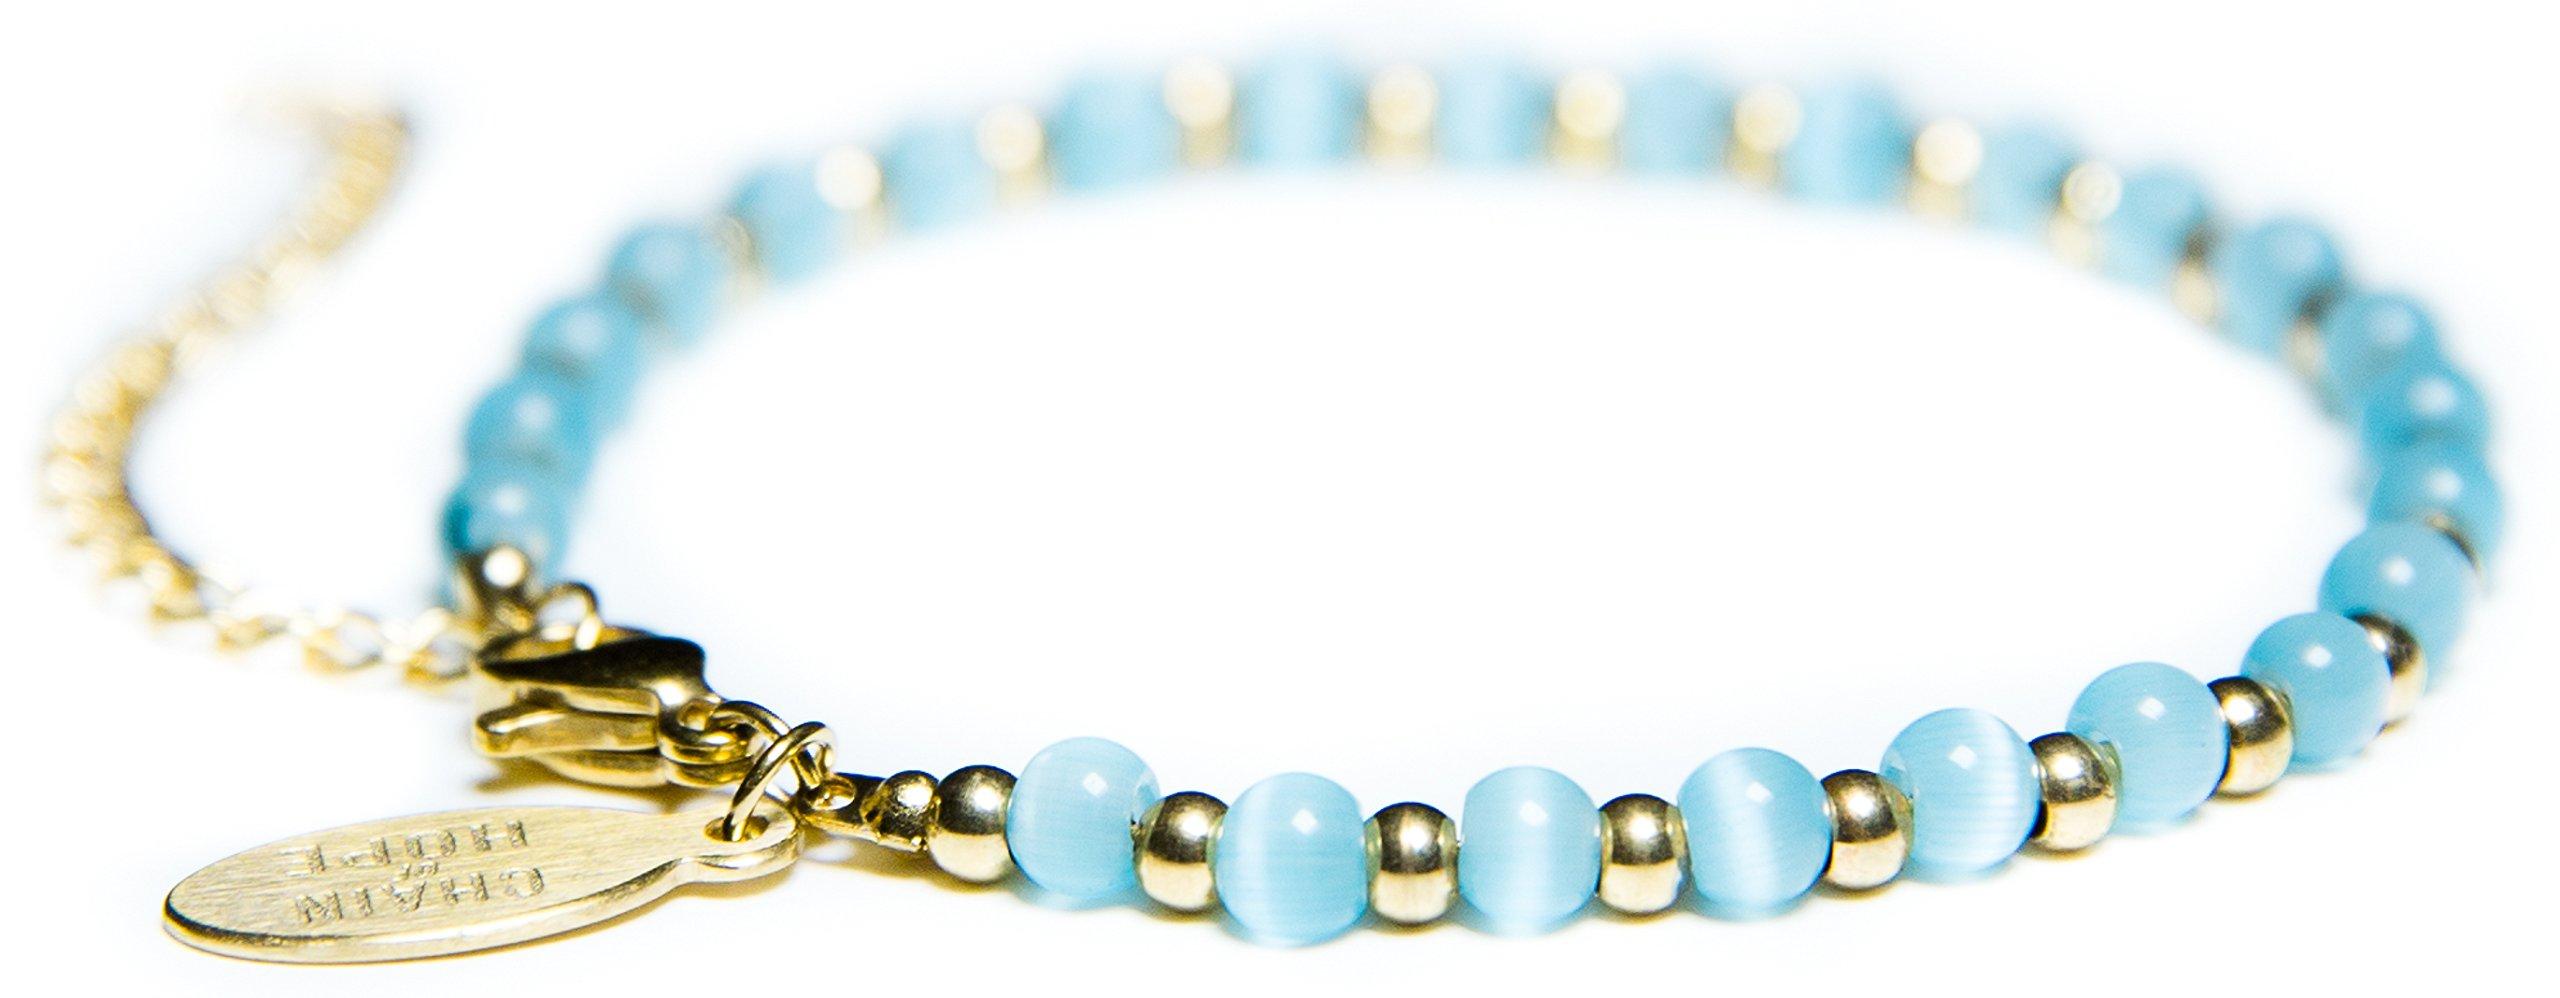 Benevolence LA 14k Gold Bracelets for Women: Turquoise Bracelet Water Drop Aqua Cat Eye Charm Glass Beads Fashionable Handmade Crystal Jewelry for Giving Back